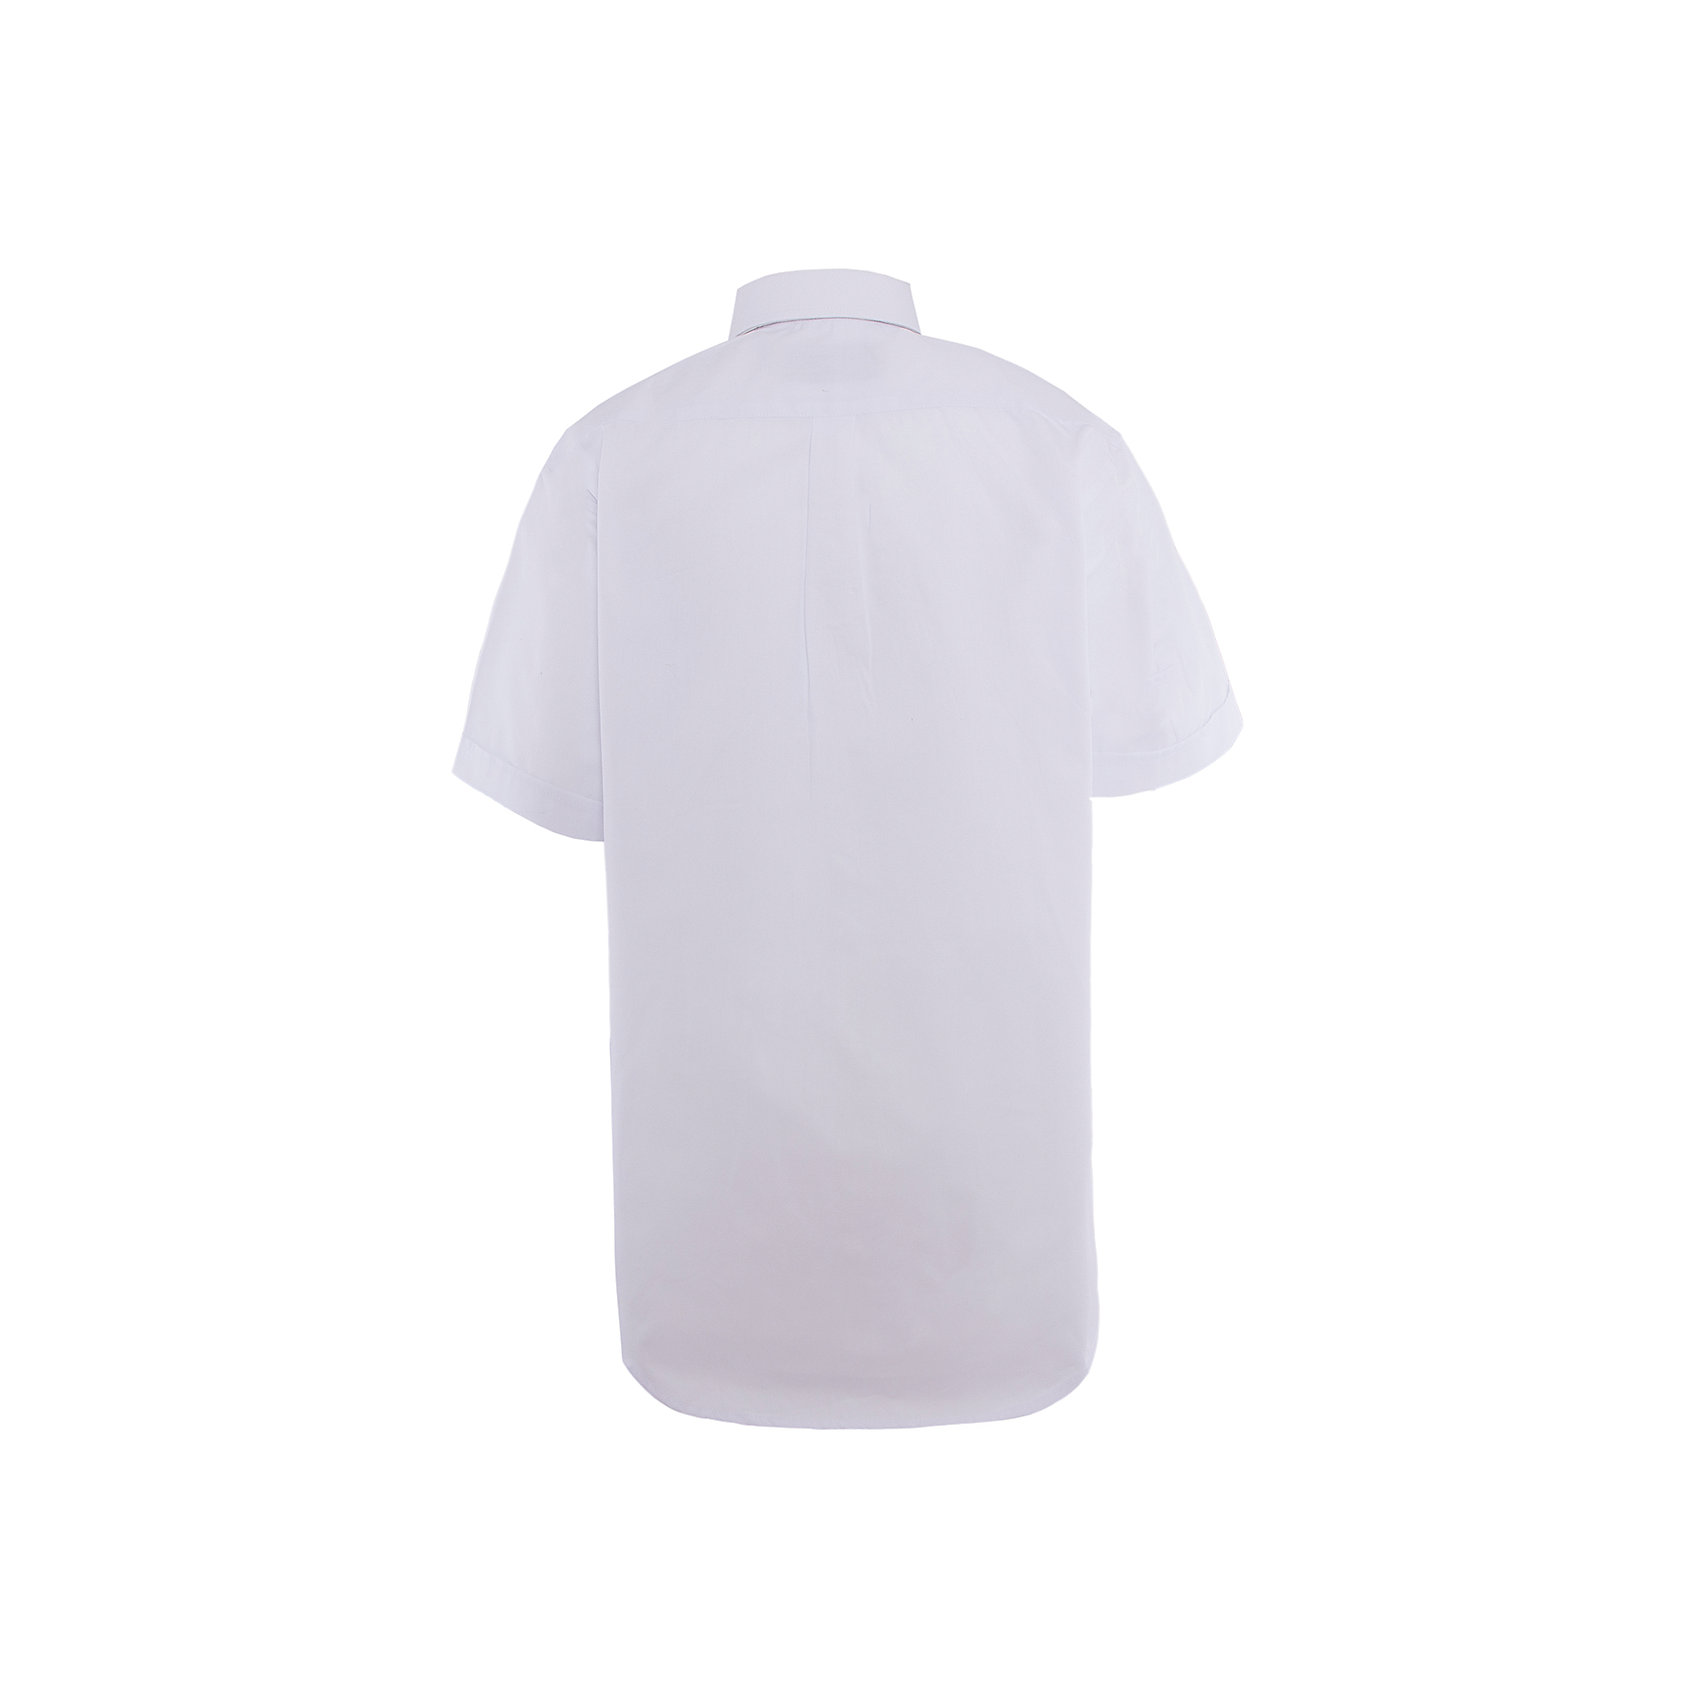 Рубашка для мальчика  Tsarevich от myToys